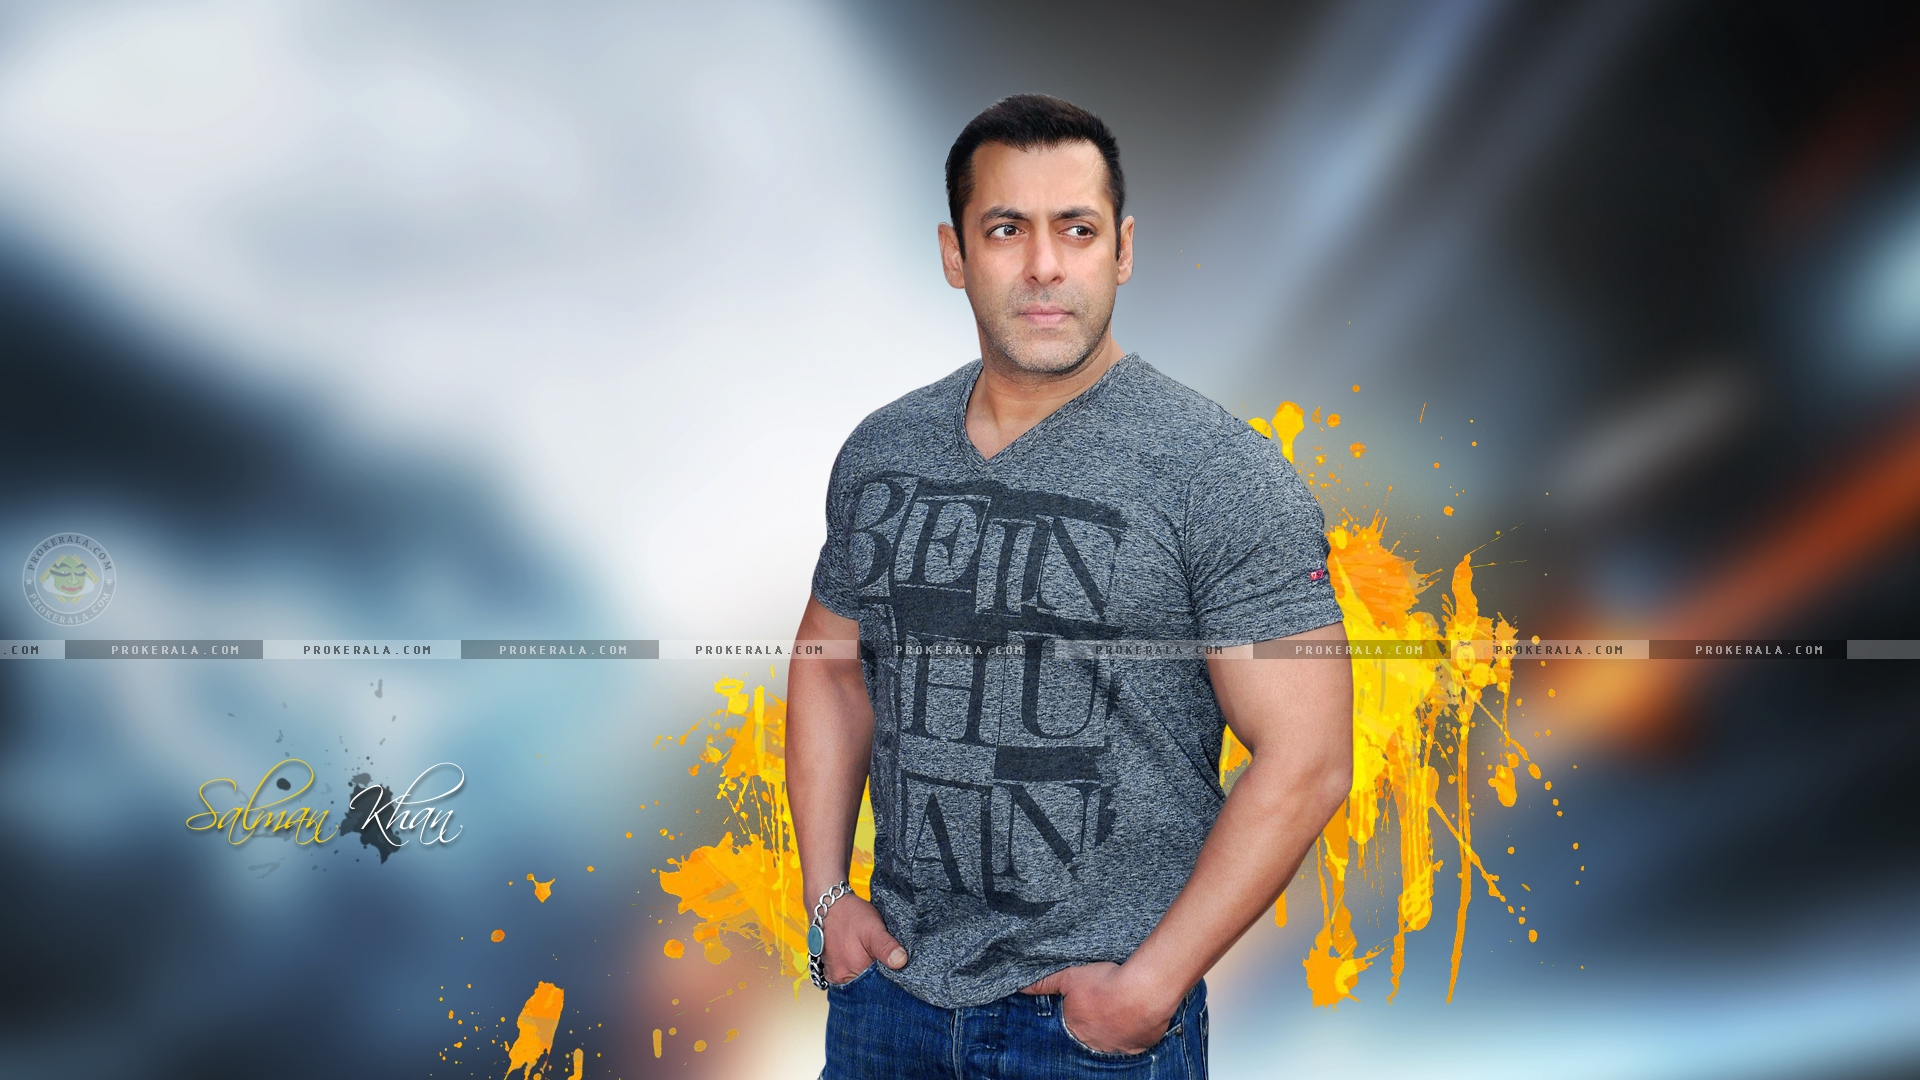 1024x768 1920x1080 Tags Salman Khan